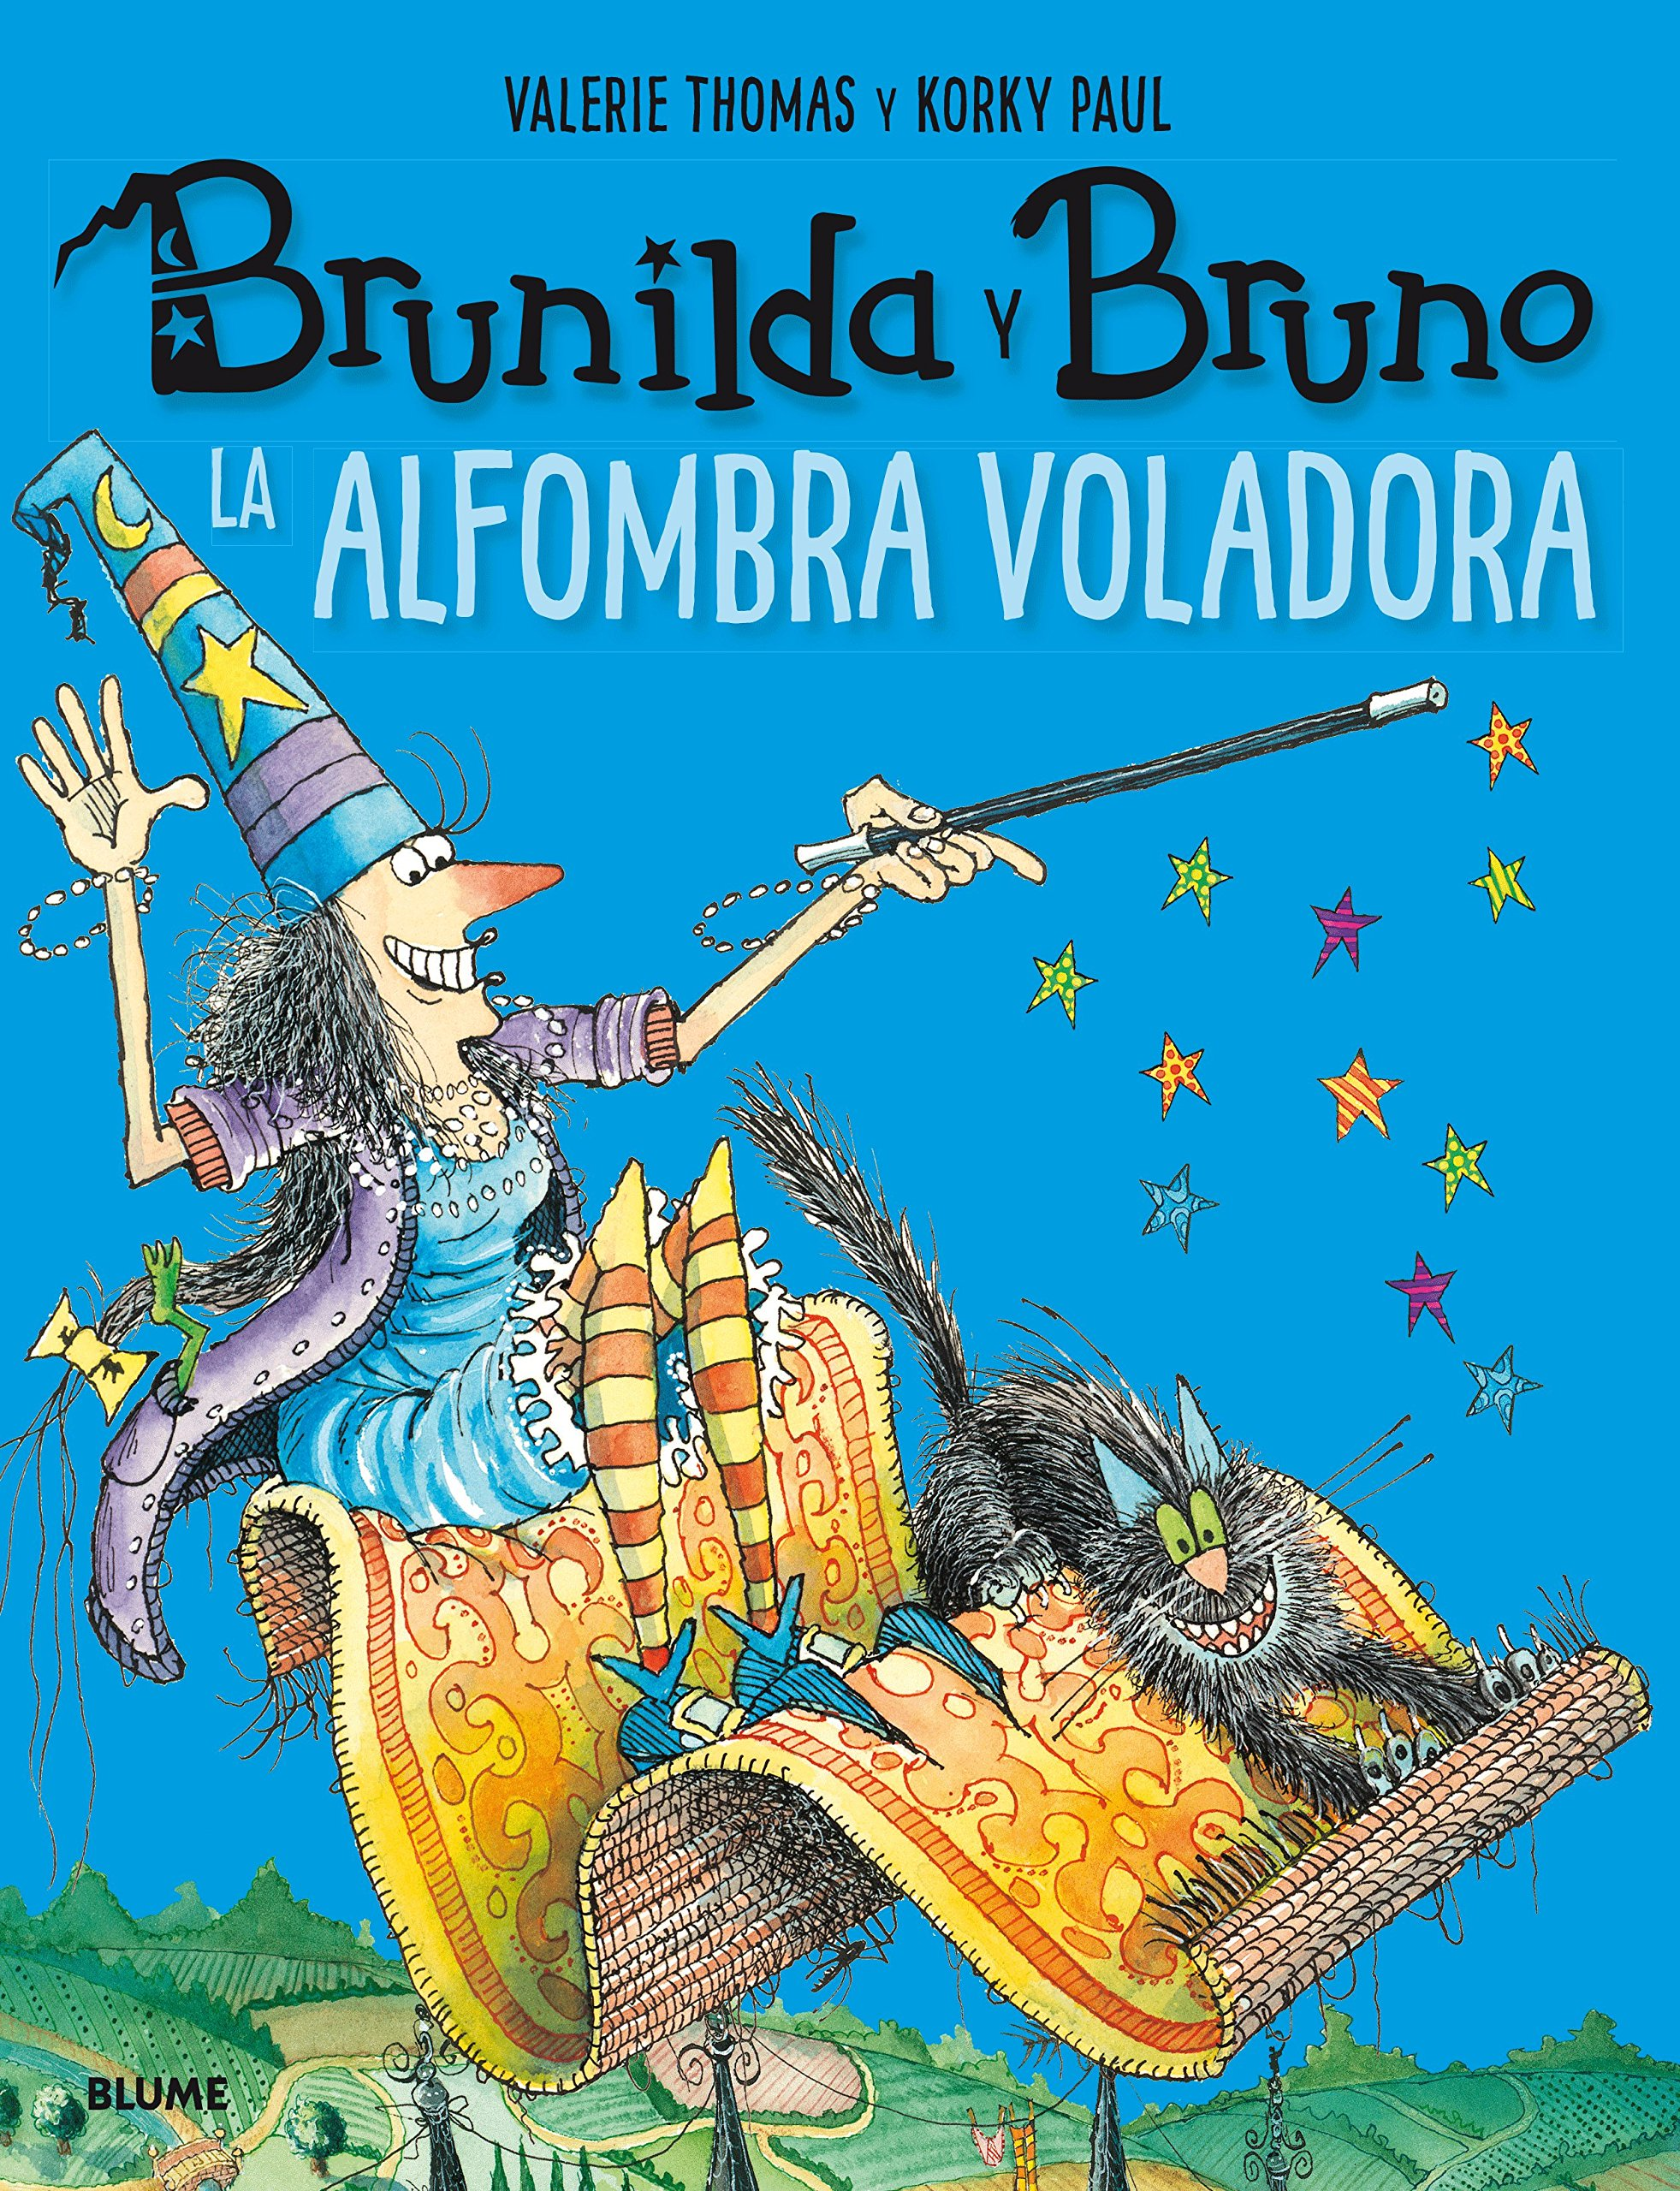 Brunilda y Bruno. La alfombra voladora: Amazon.es: Thomas, Valerie, Korky, Paul, Rodríguez Fischer, Cristina, Diéguez Diéguez, Remedios: Libros